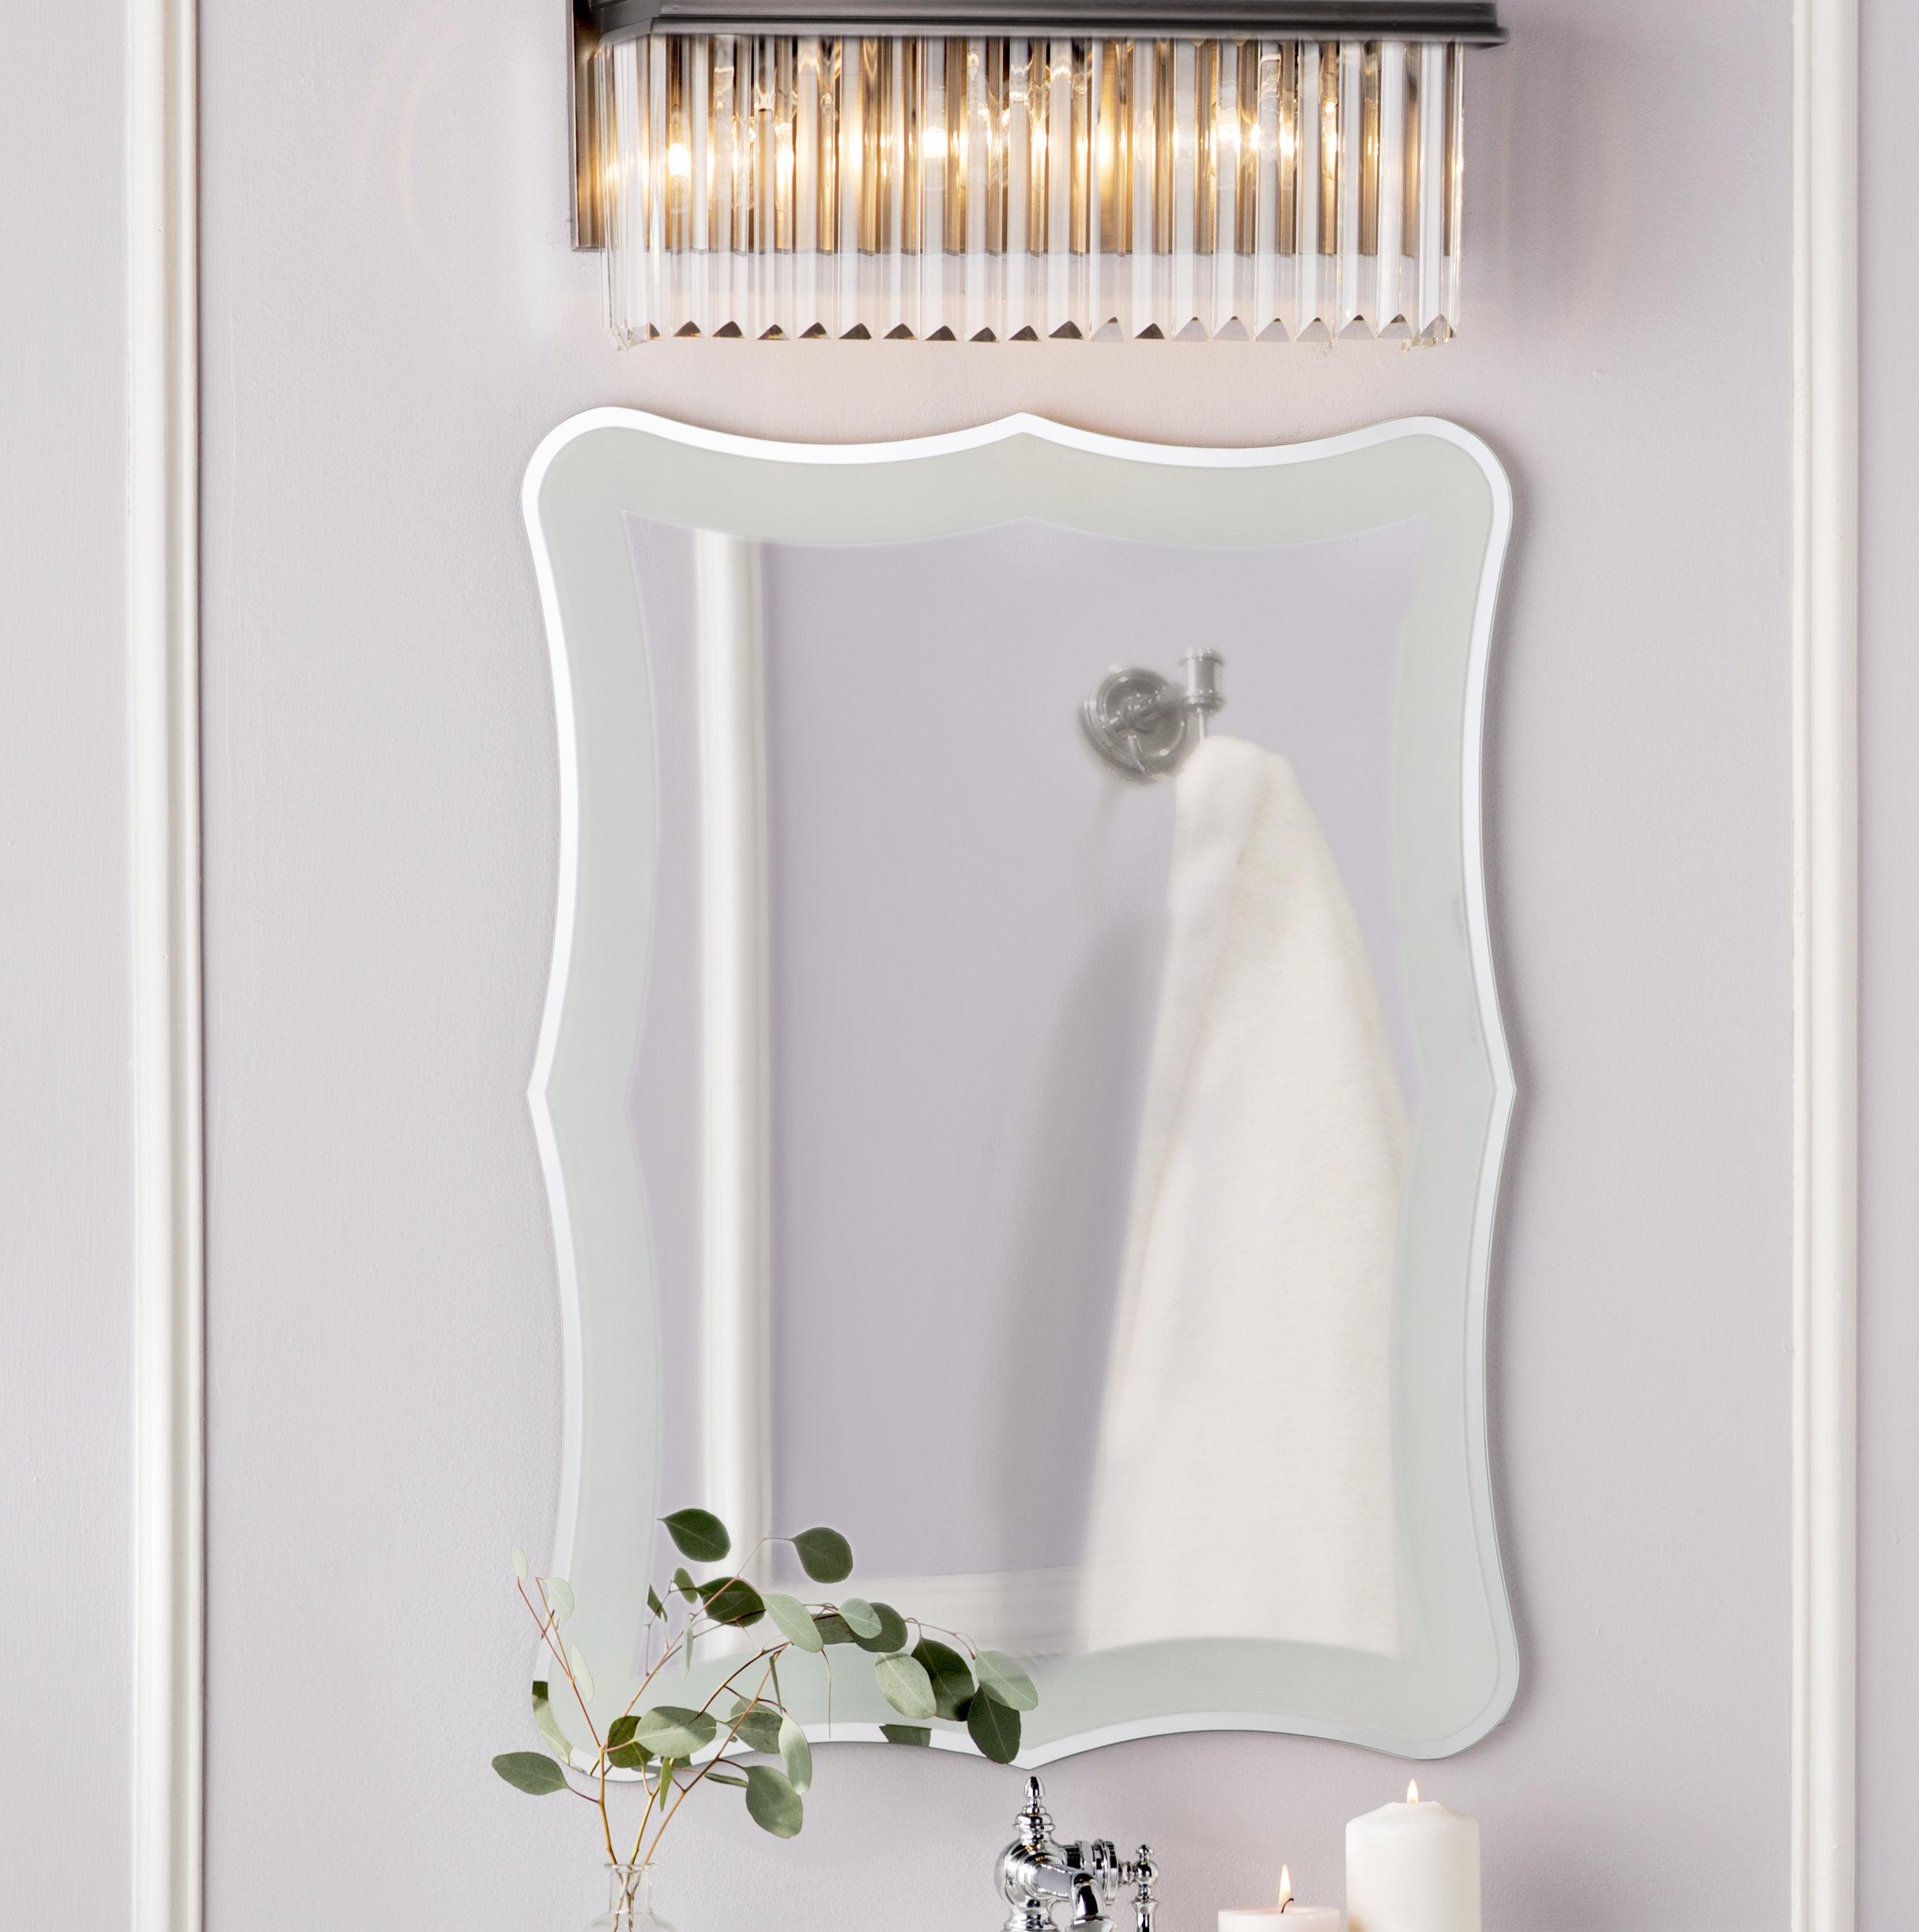 Logan Frameless Wall Mirror Within Traditional Frameless Diamond Wall Mirrors (Image 10 of 20)